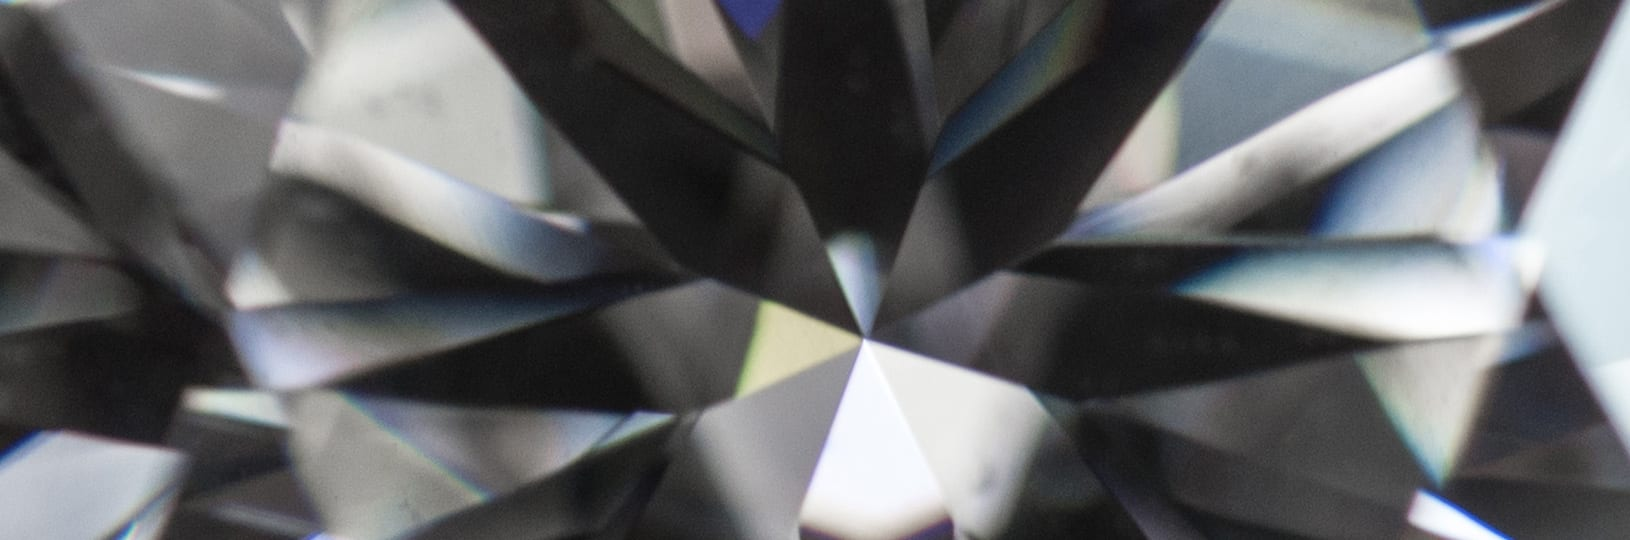 Moissanite is a beautiful diamond alternative